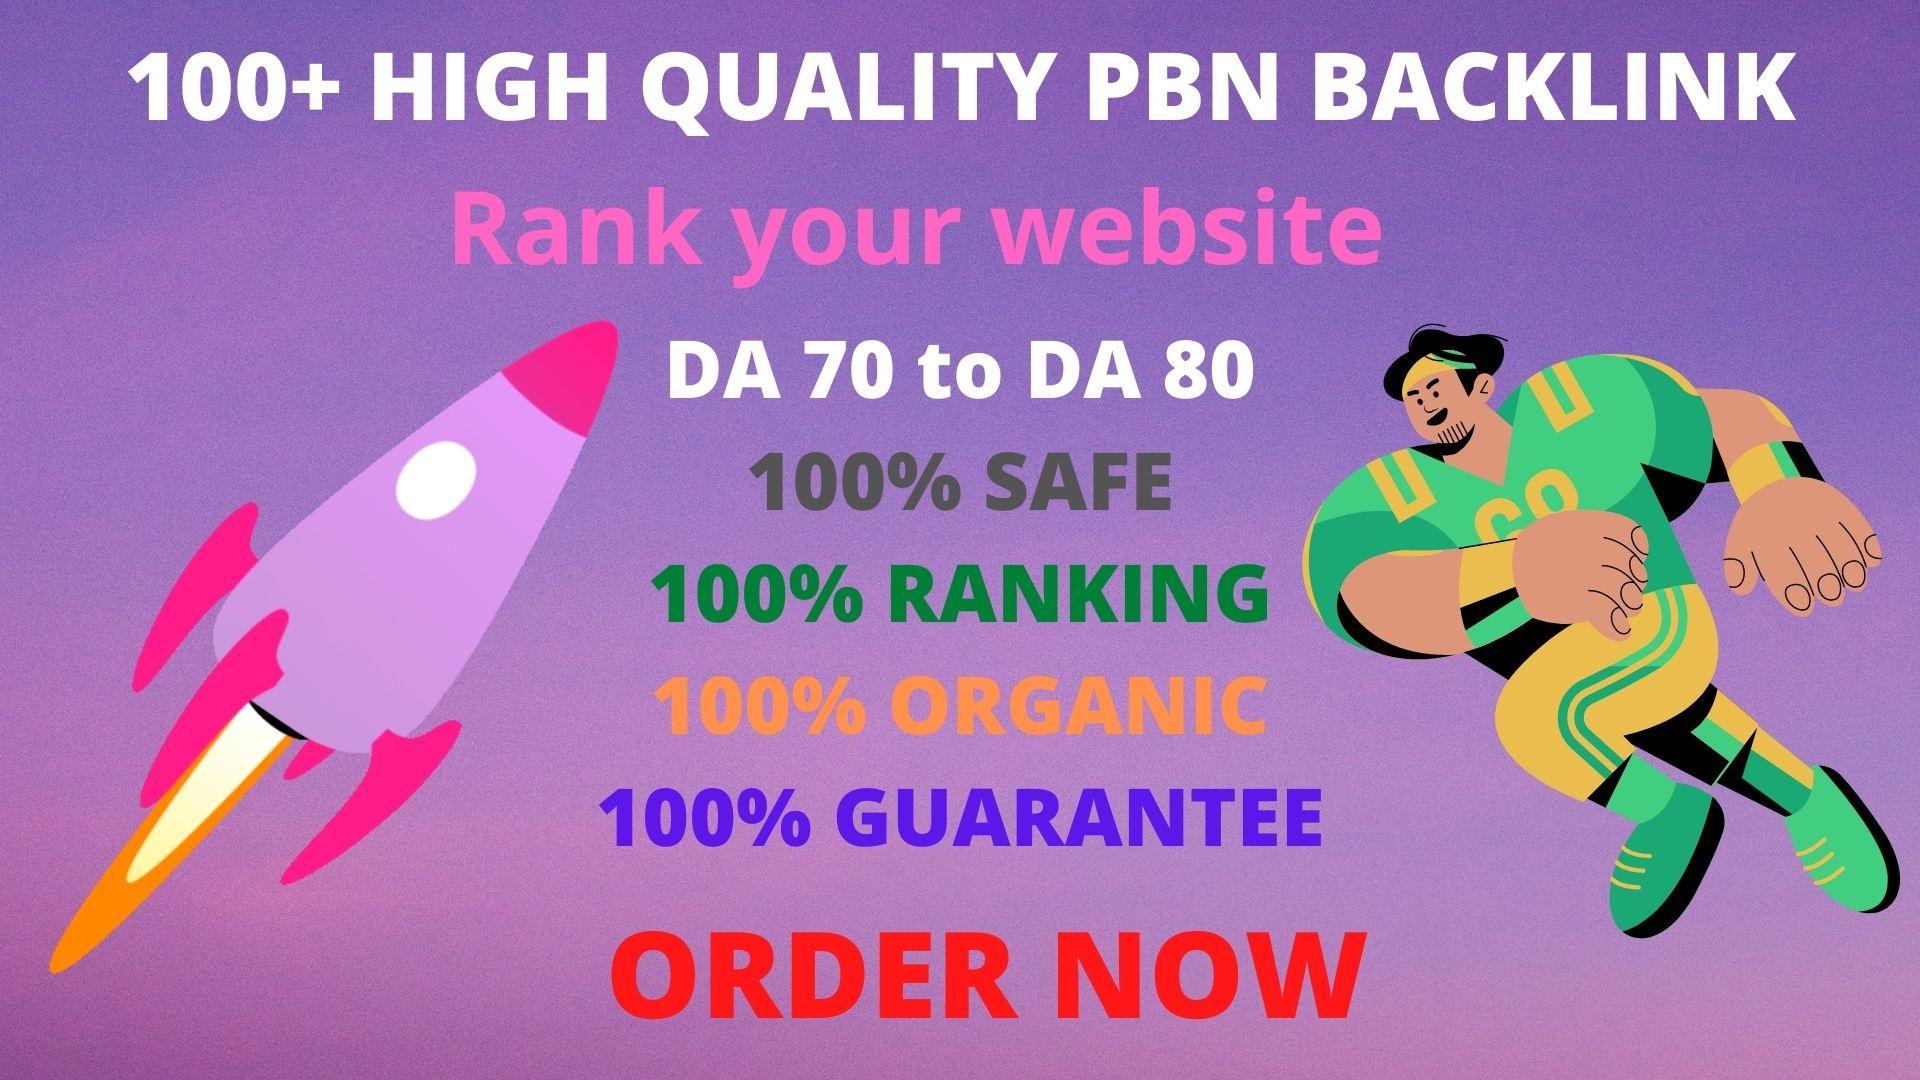 Get 100+High DA 60+PBN Backlink to Rank Your Website.